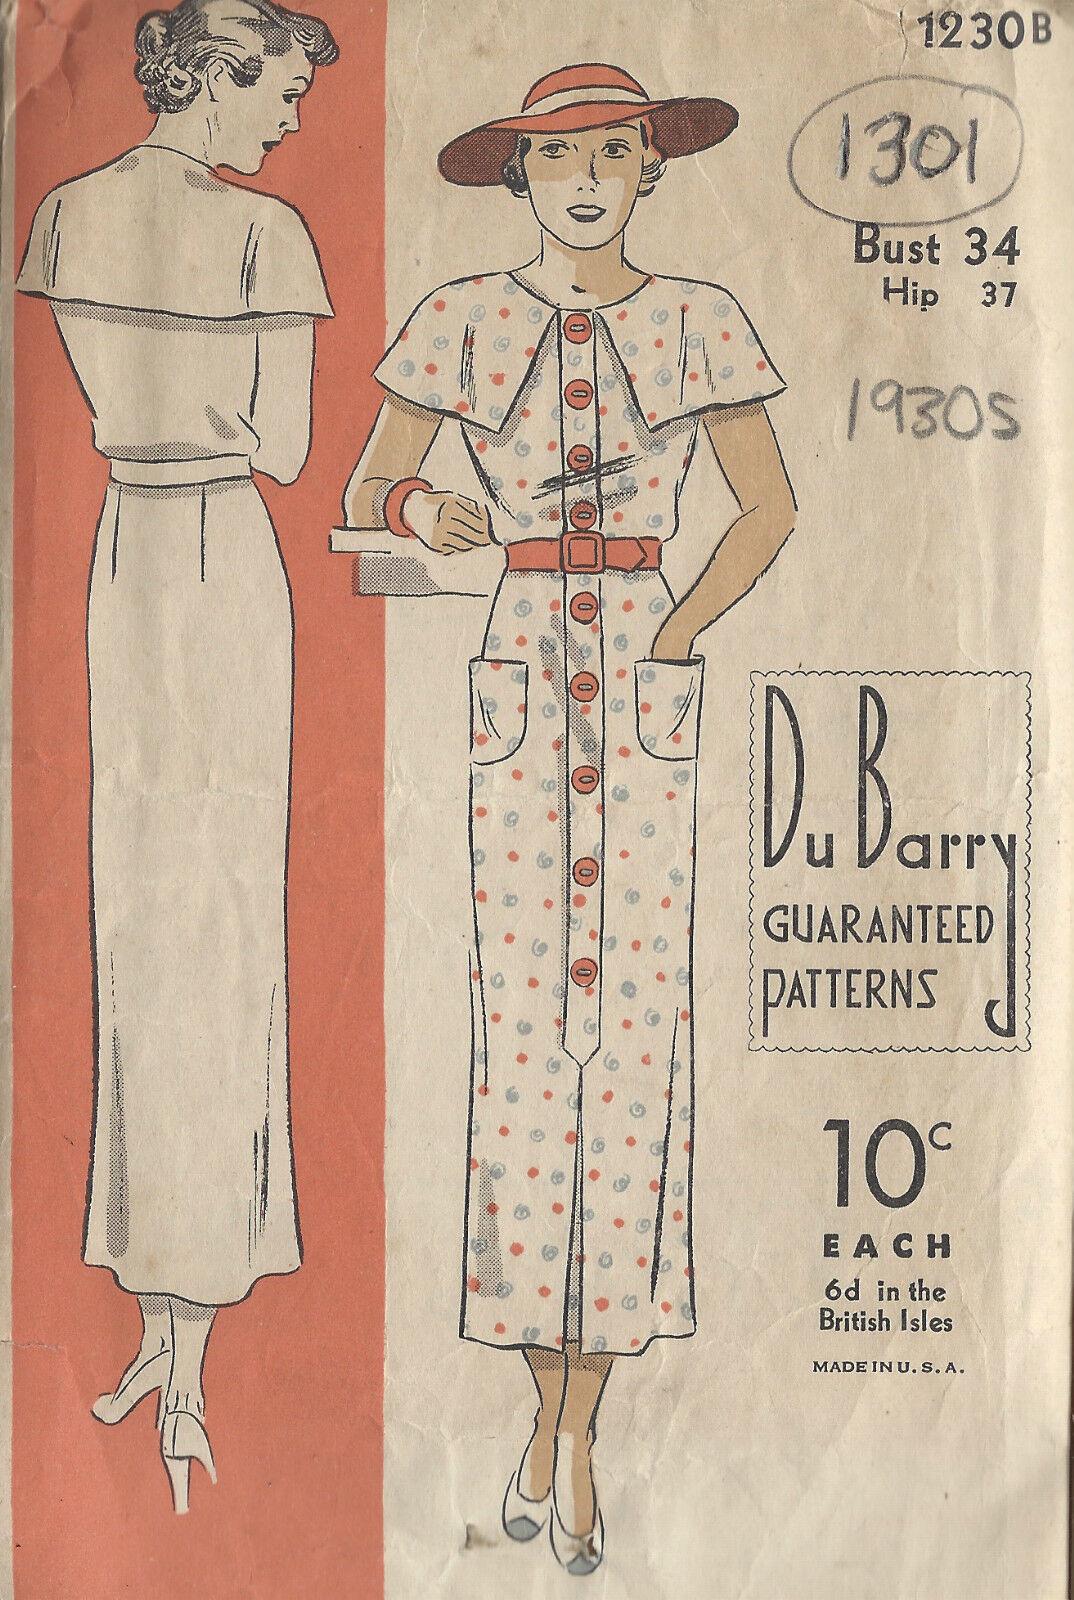 1930s vintage sewing pattern b34 dress 1301 ebay picture 1 of 2 jeuxipadfo Choice Image